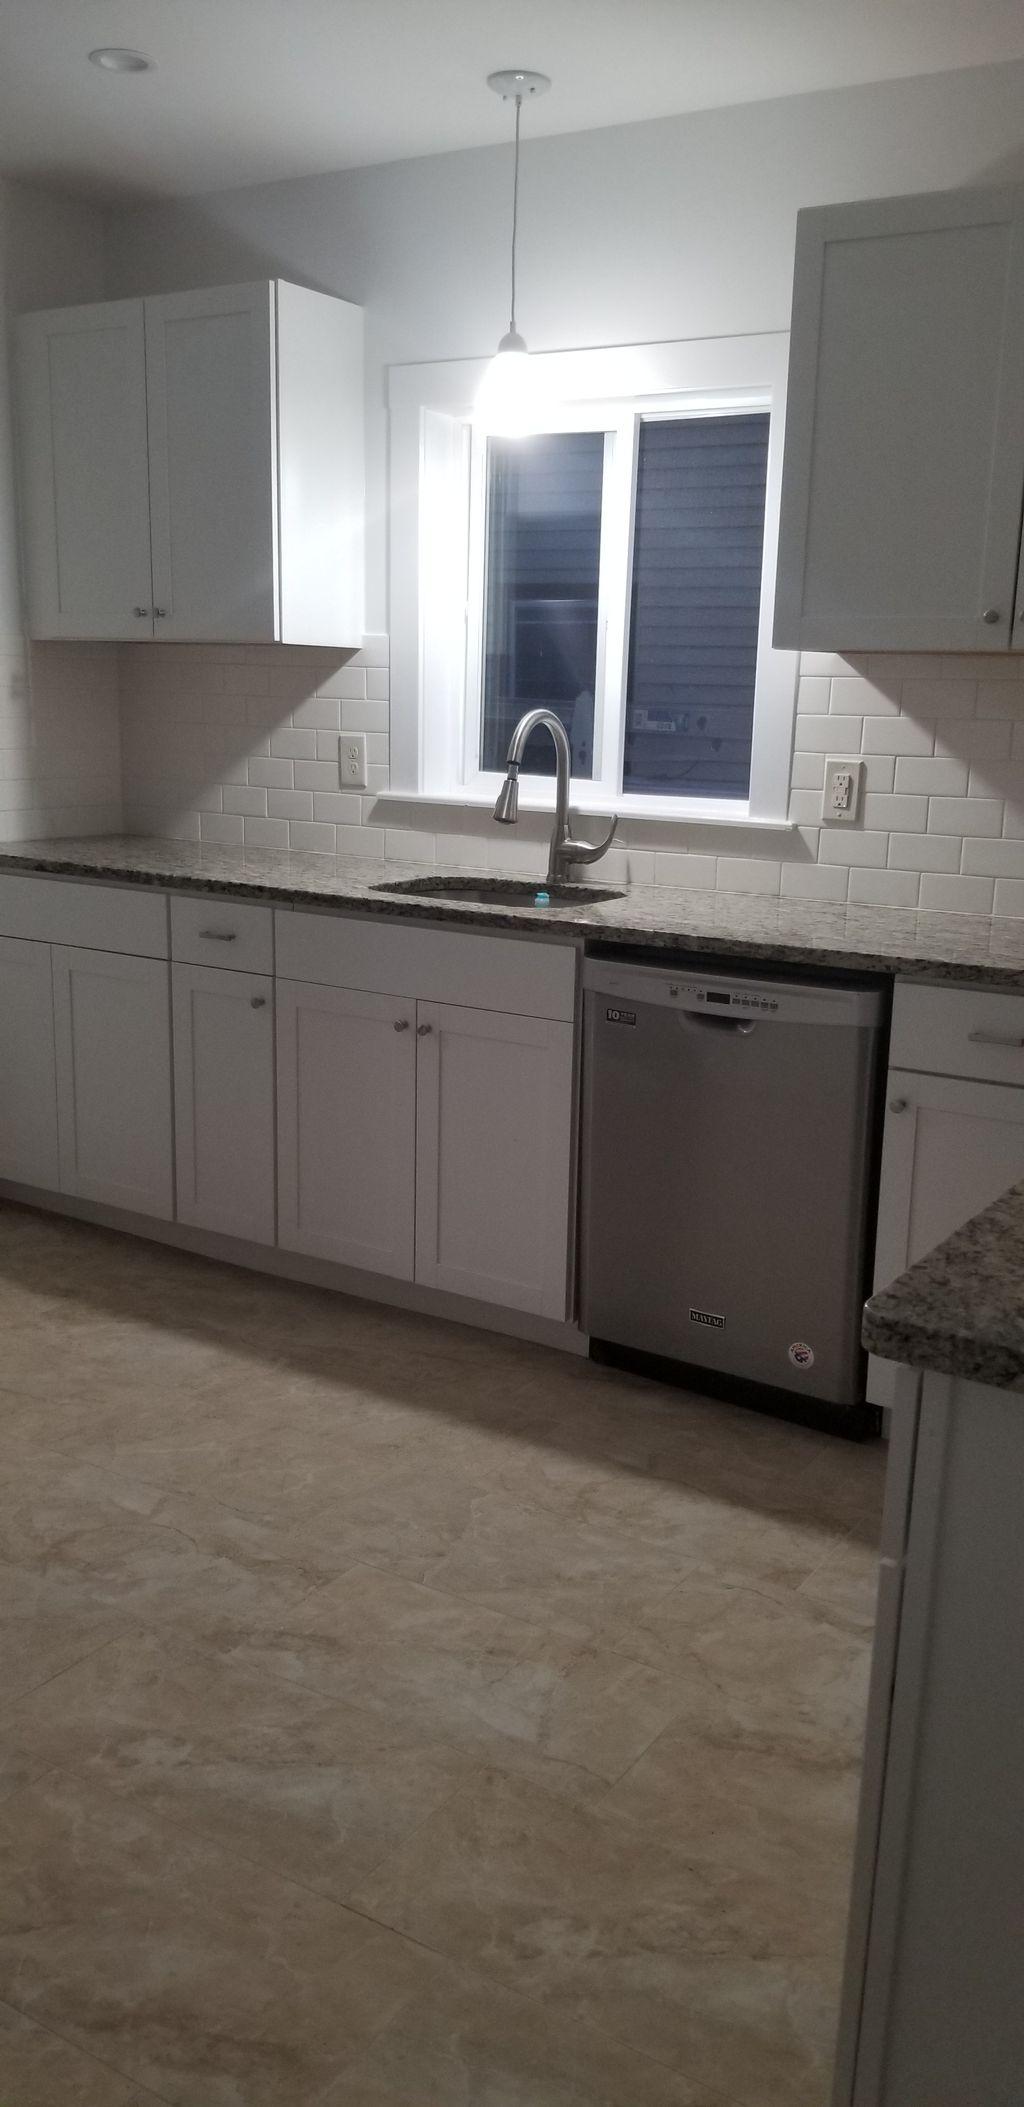 Home improvement renovation